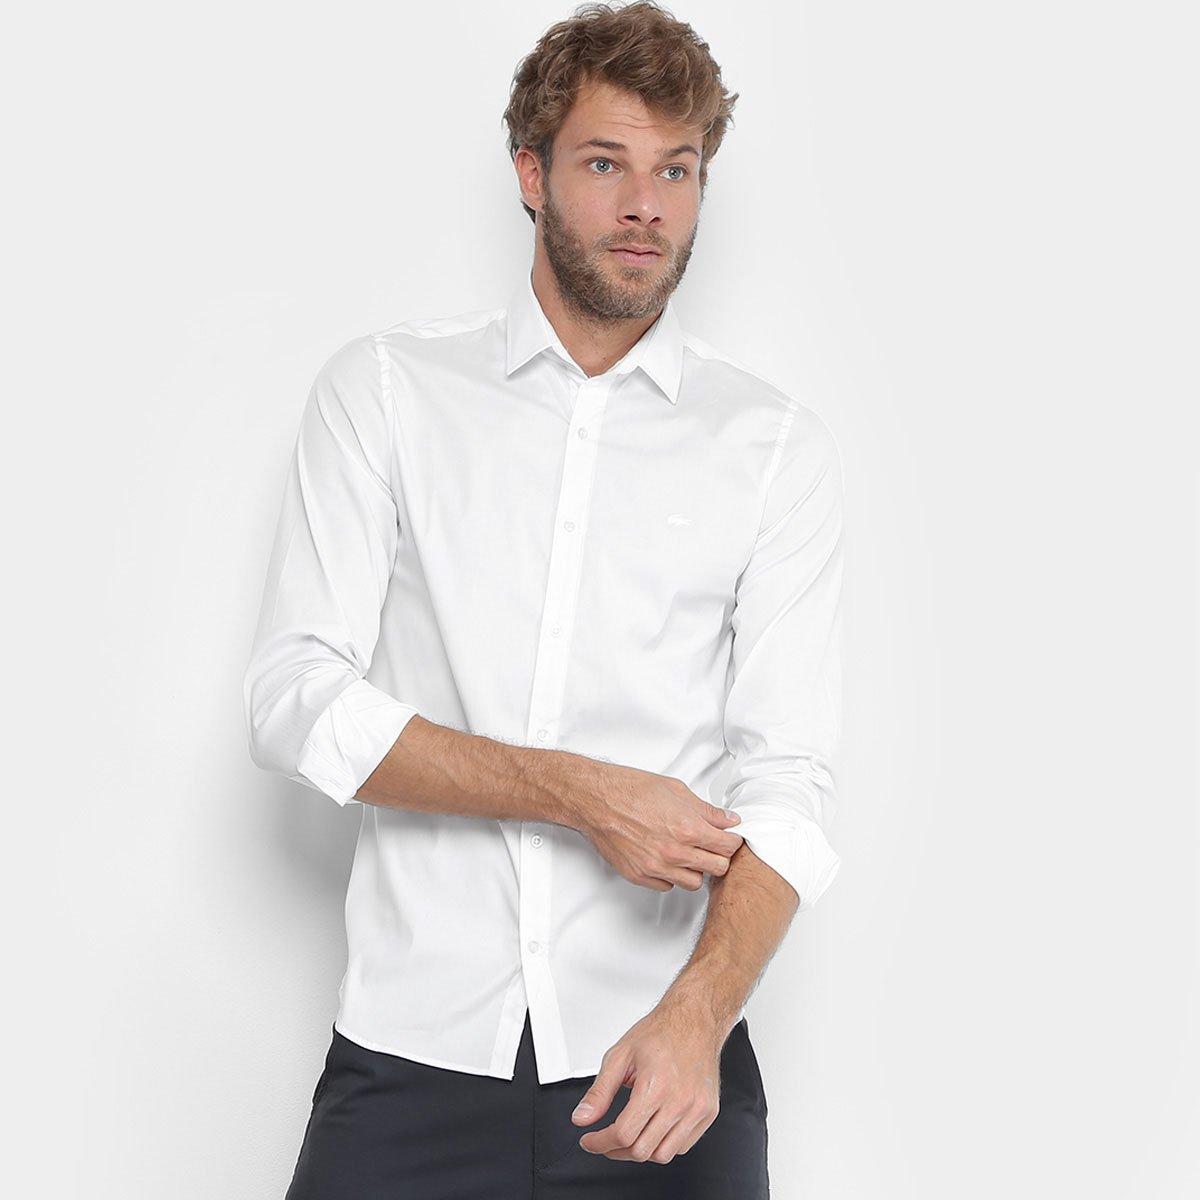 Camisa Lacoste Slim Fit com Logo Masculina - Compre Agora   Netshoes 659a22d9d2